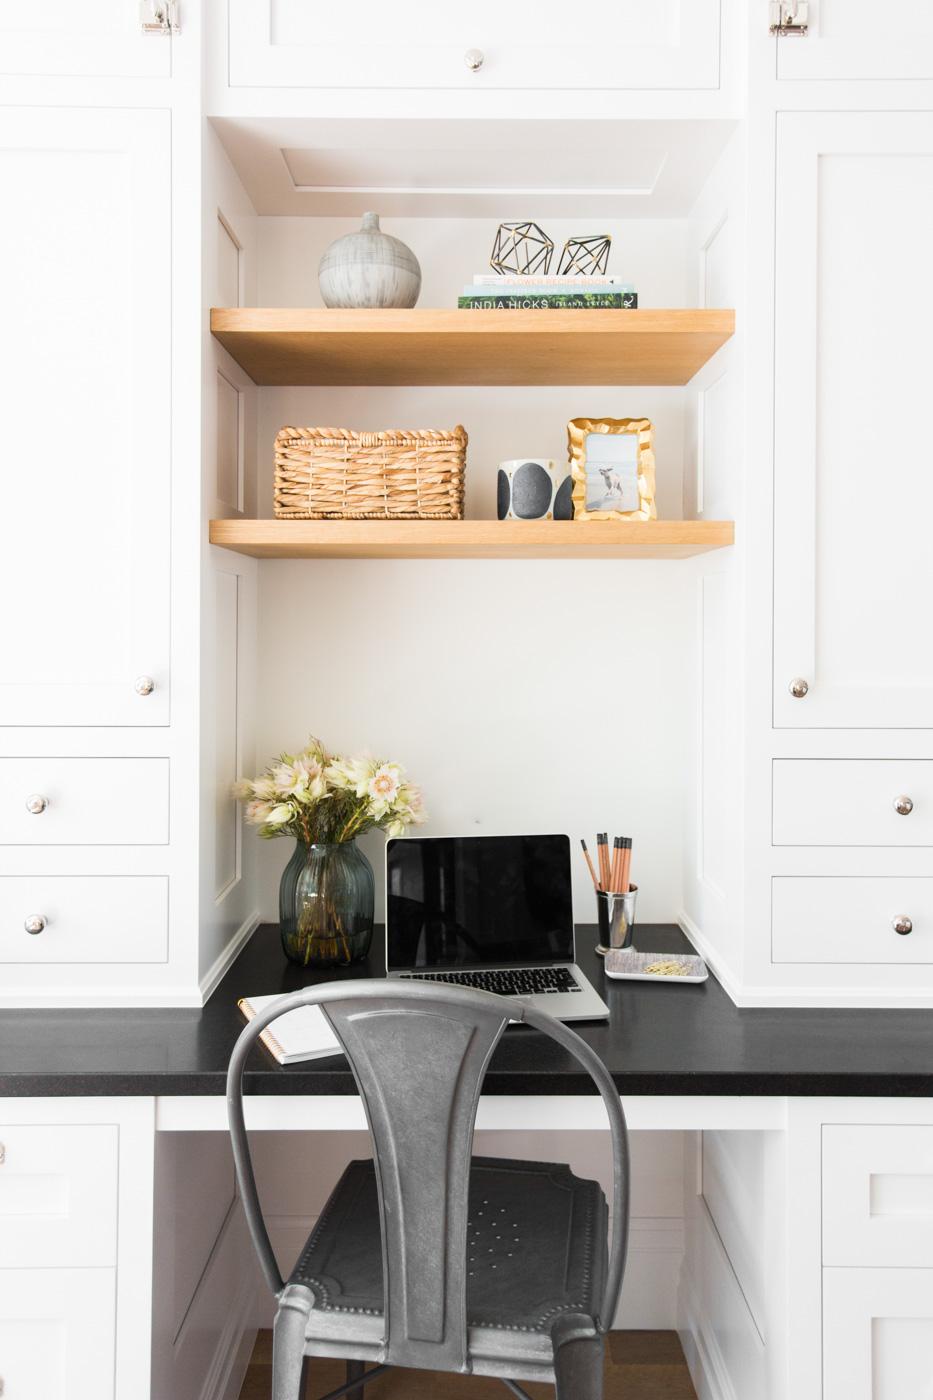 Built-in+workstation+in+the+kitchen+||+Studio+McGee.jpg